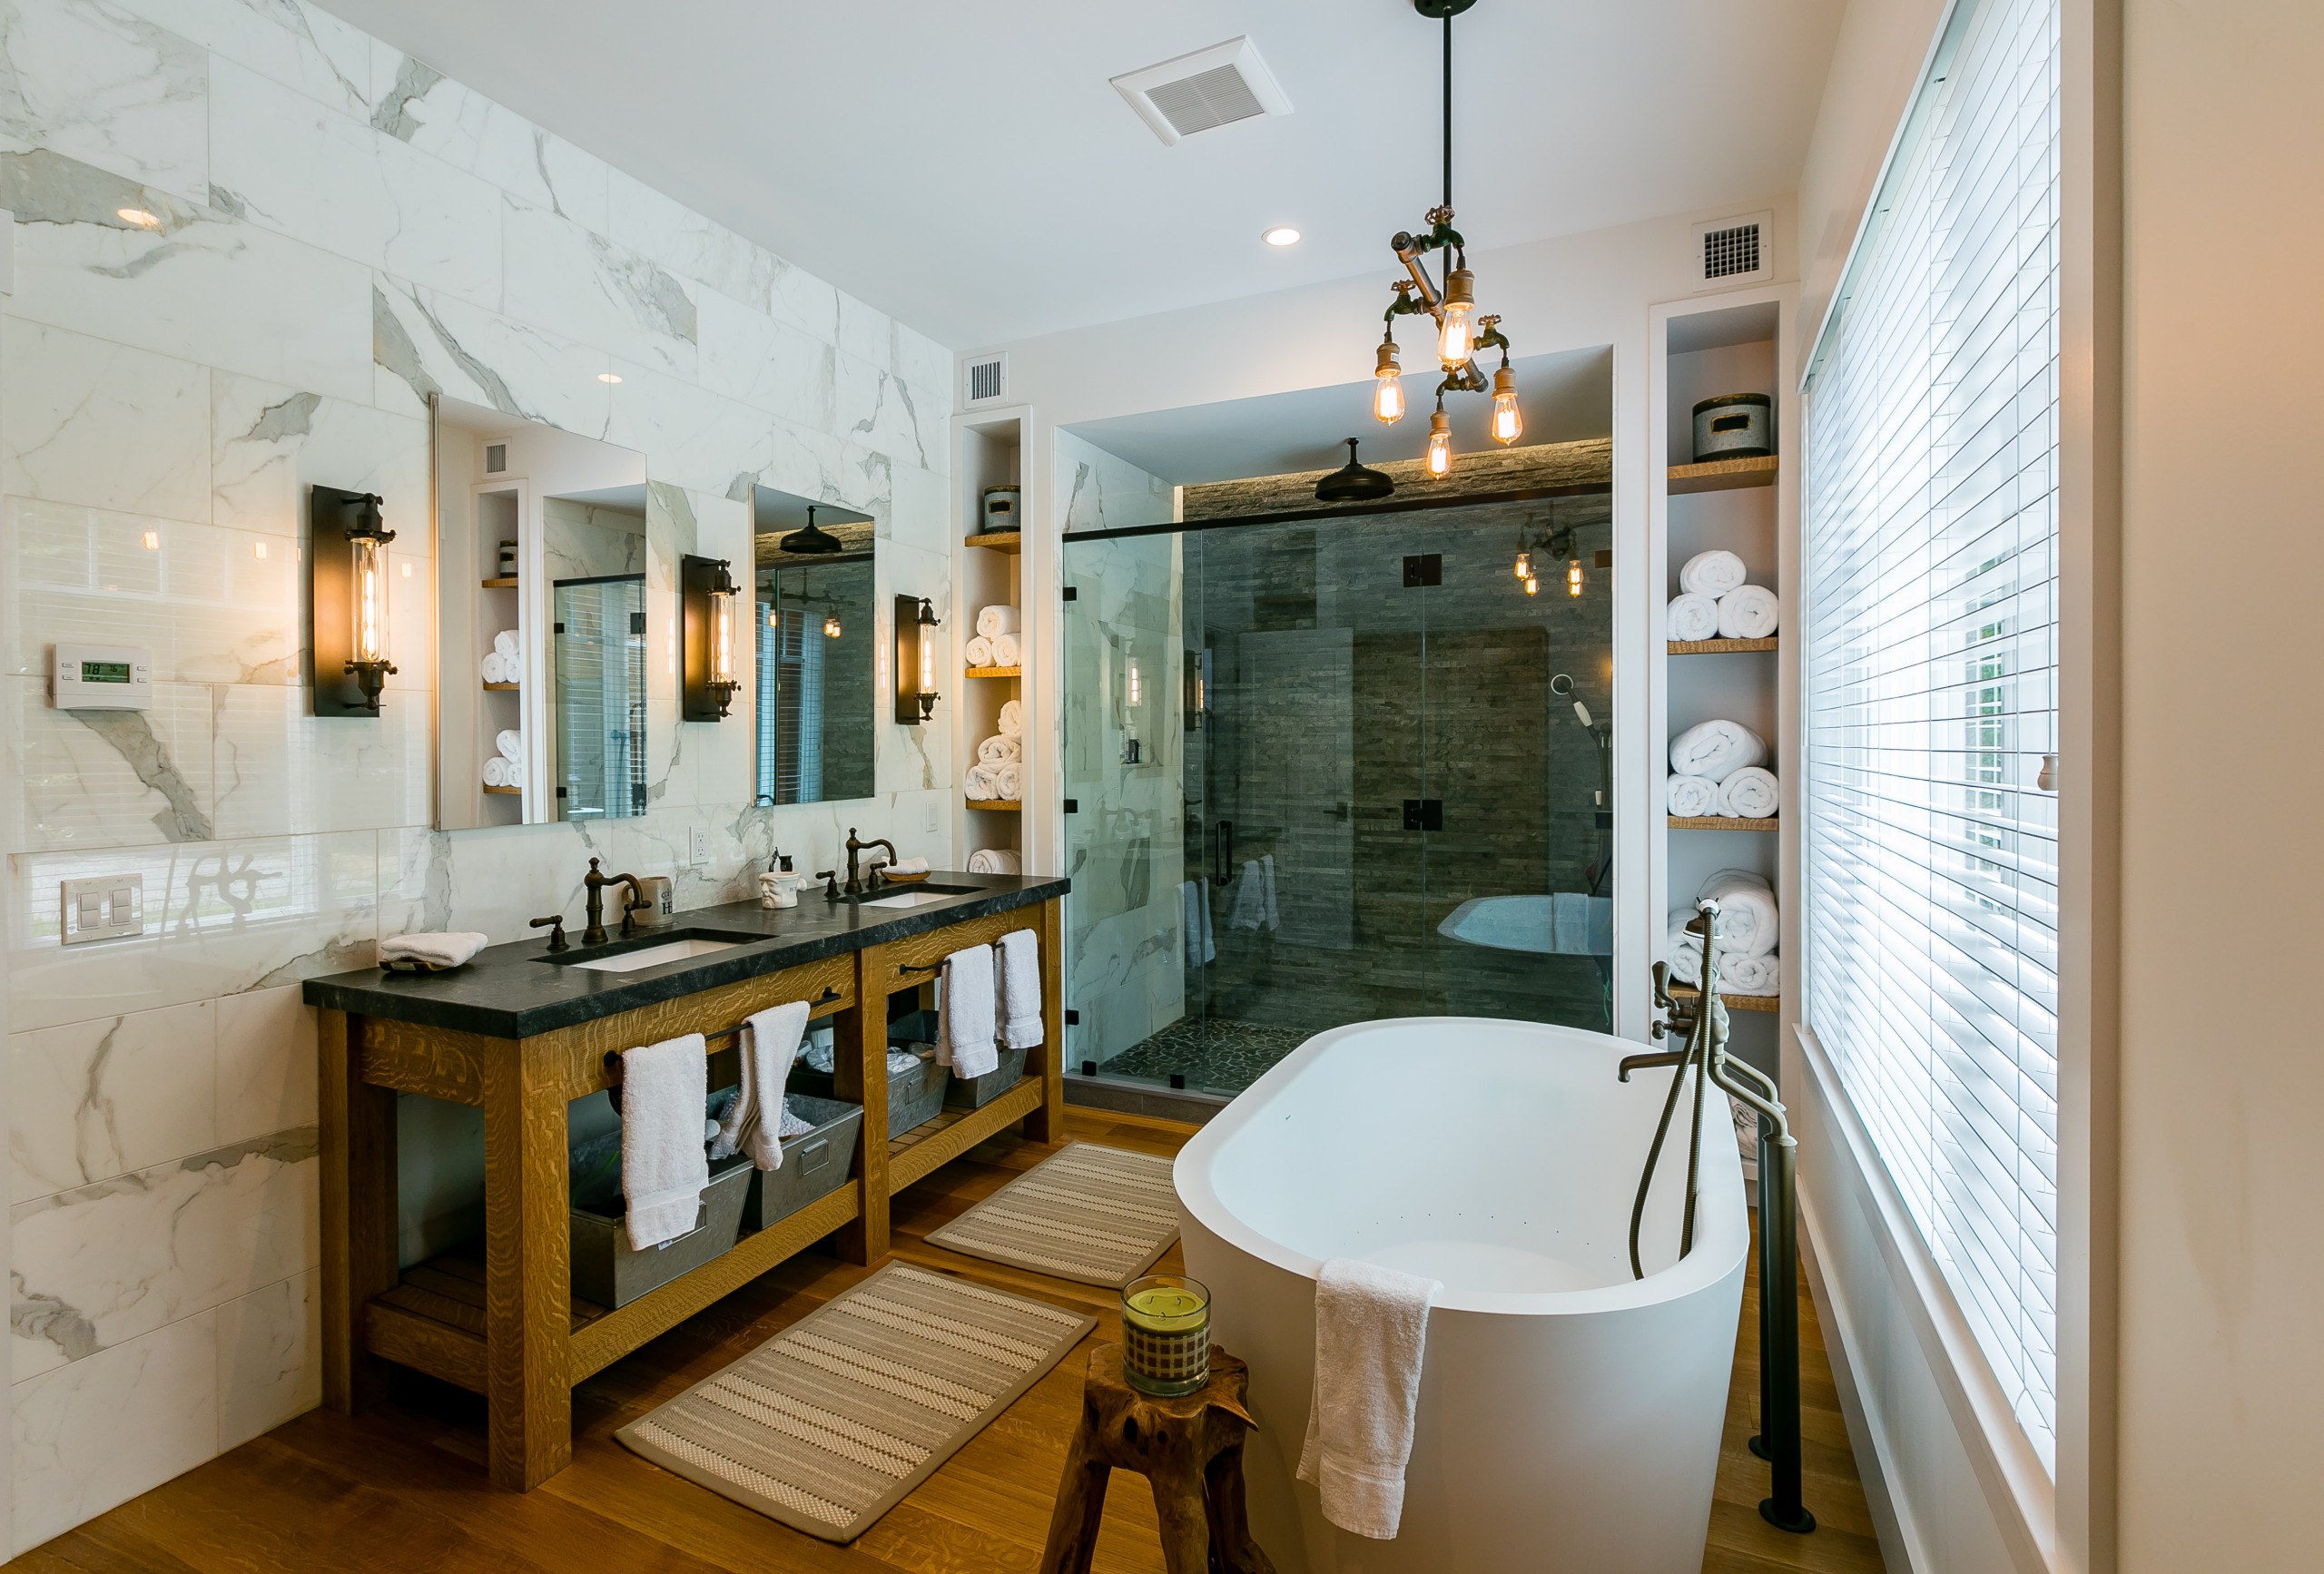 75 Beautiful Rustic Bathroom Design Ideas & Pictures | Houzz on navy bathroom design, chocolate bathroom design, sage bathroom design, violet bathroom design, pewter bathroom design, wood bathroom design, onyx bathroom design, forest bathroom design, steel bathroom design, quartz bathroom design, mauve bathroom design, ivory bathroom design, bronze bathroom design, brick bathroom design, desert bathroom design, gold bathroom design, cherry bathroom design, pine bathroom design, espresso bathroom design, peach bathroom design,